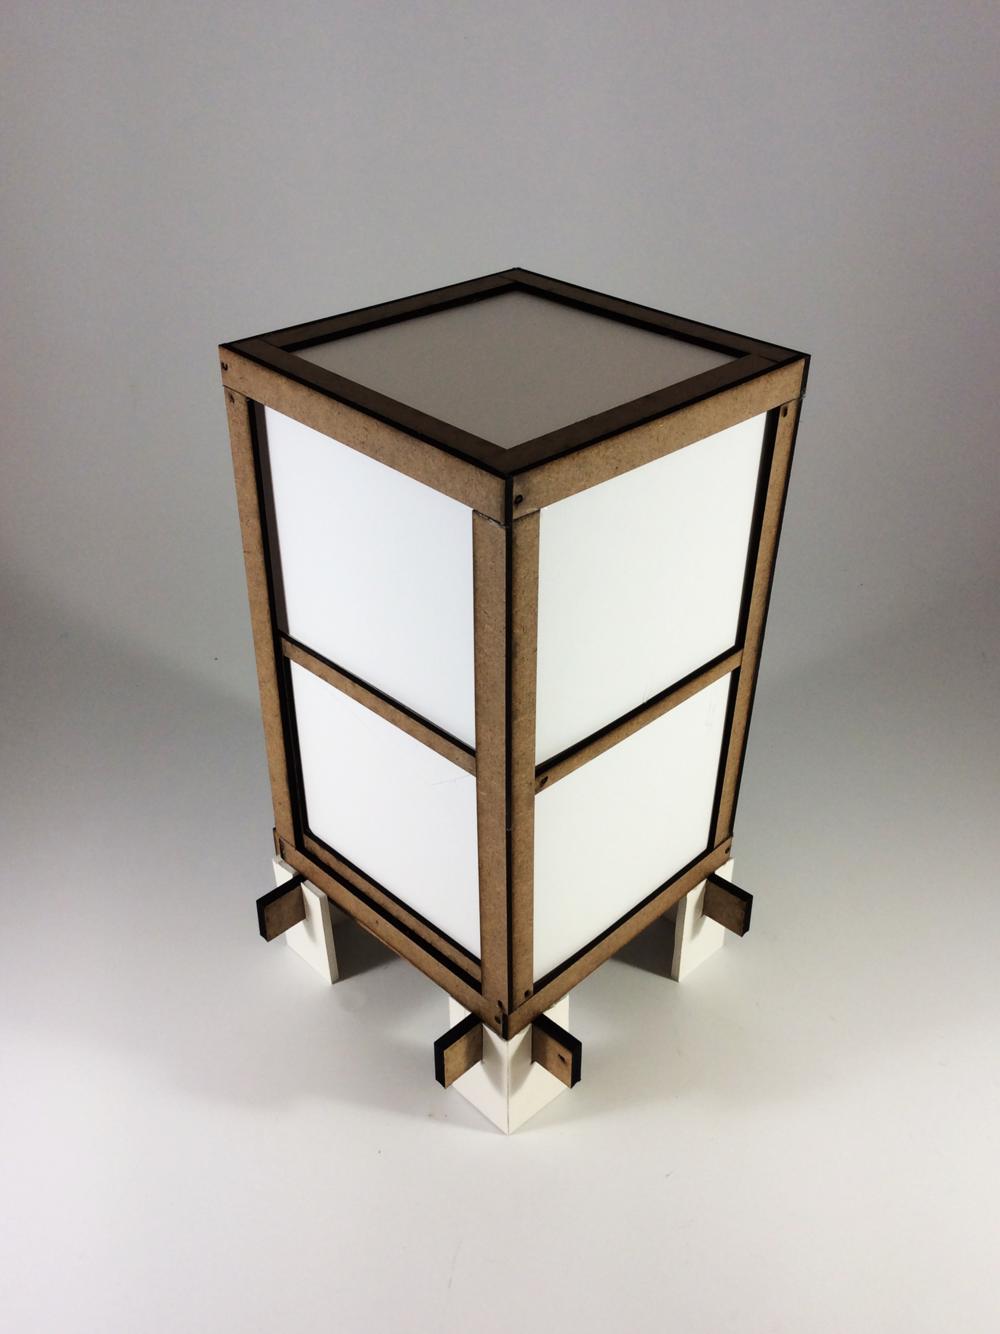 Fiberboard Prototype